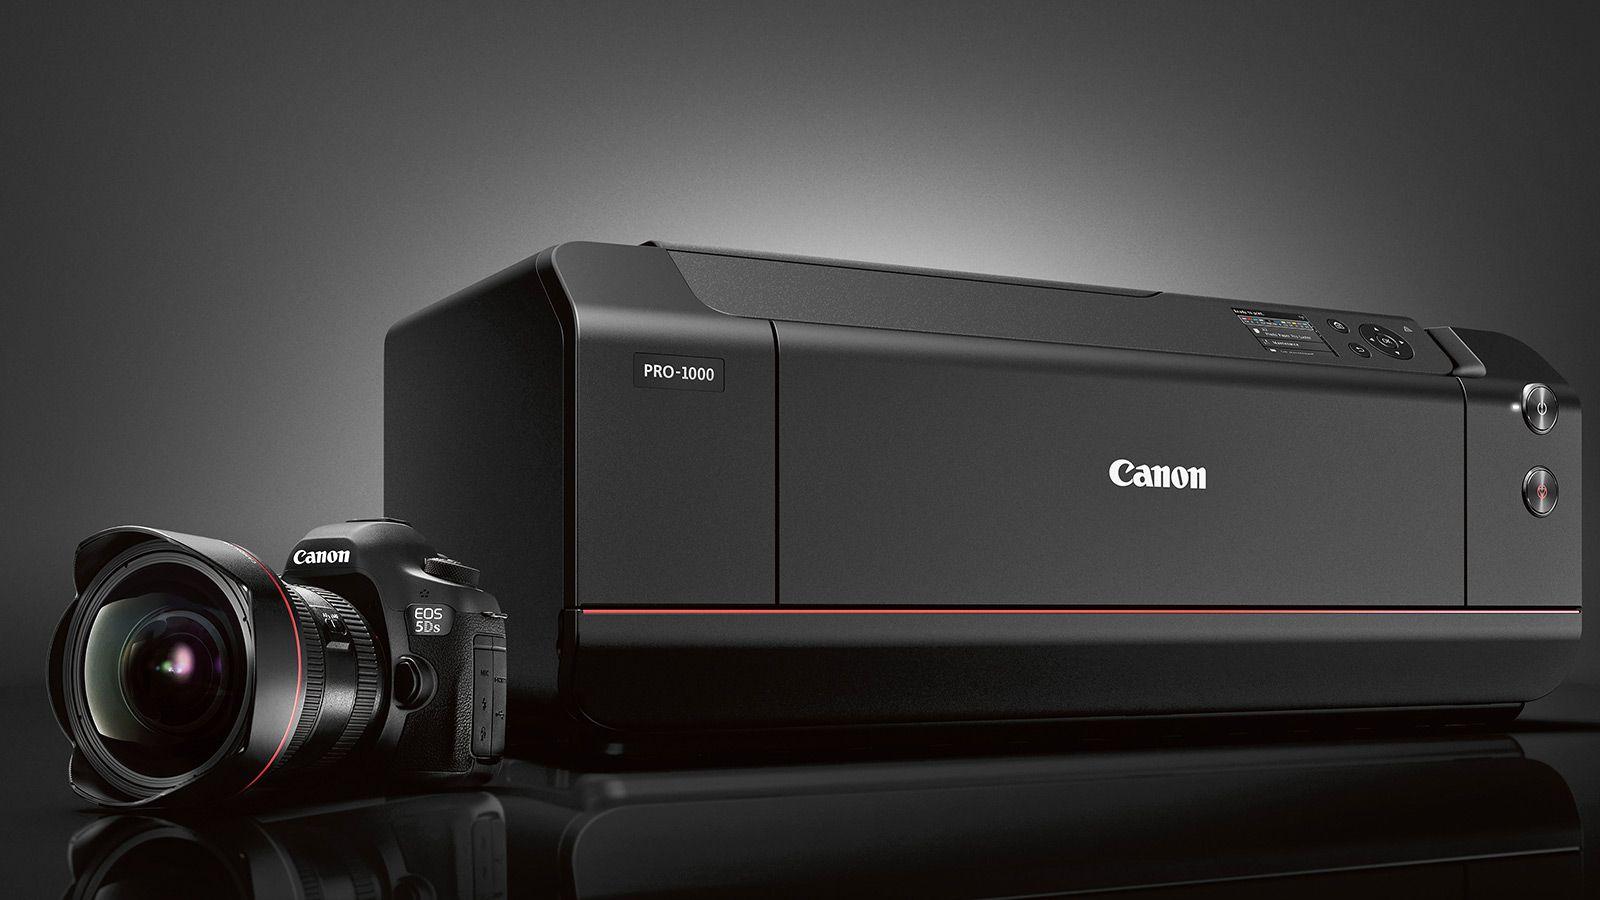 Canon-Prograf-Printer-GP100-Gear-Patrol-HERO